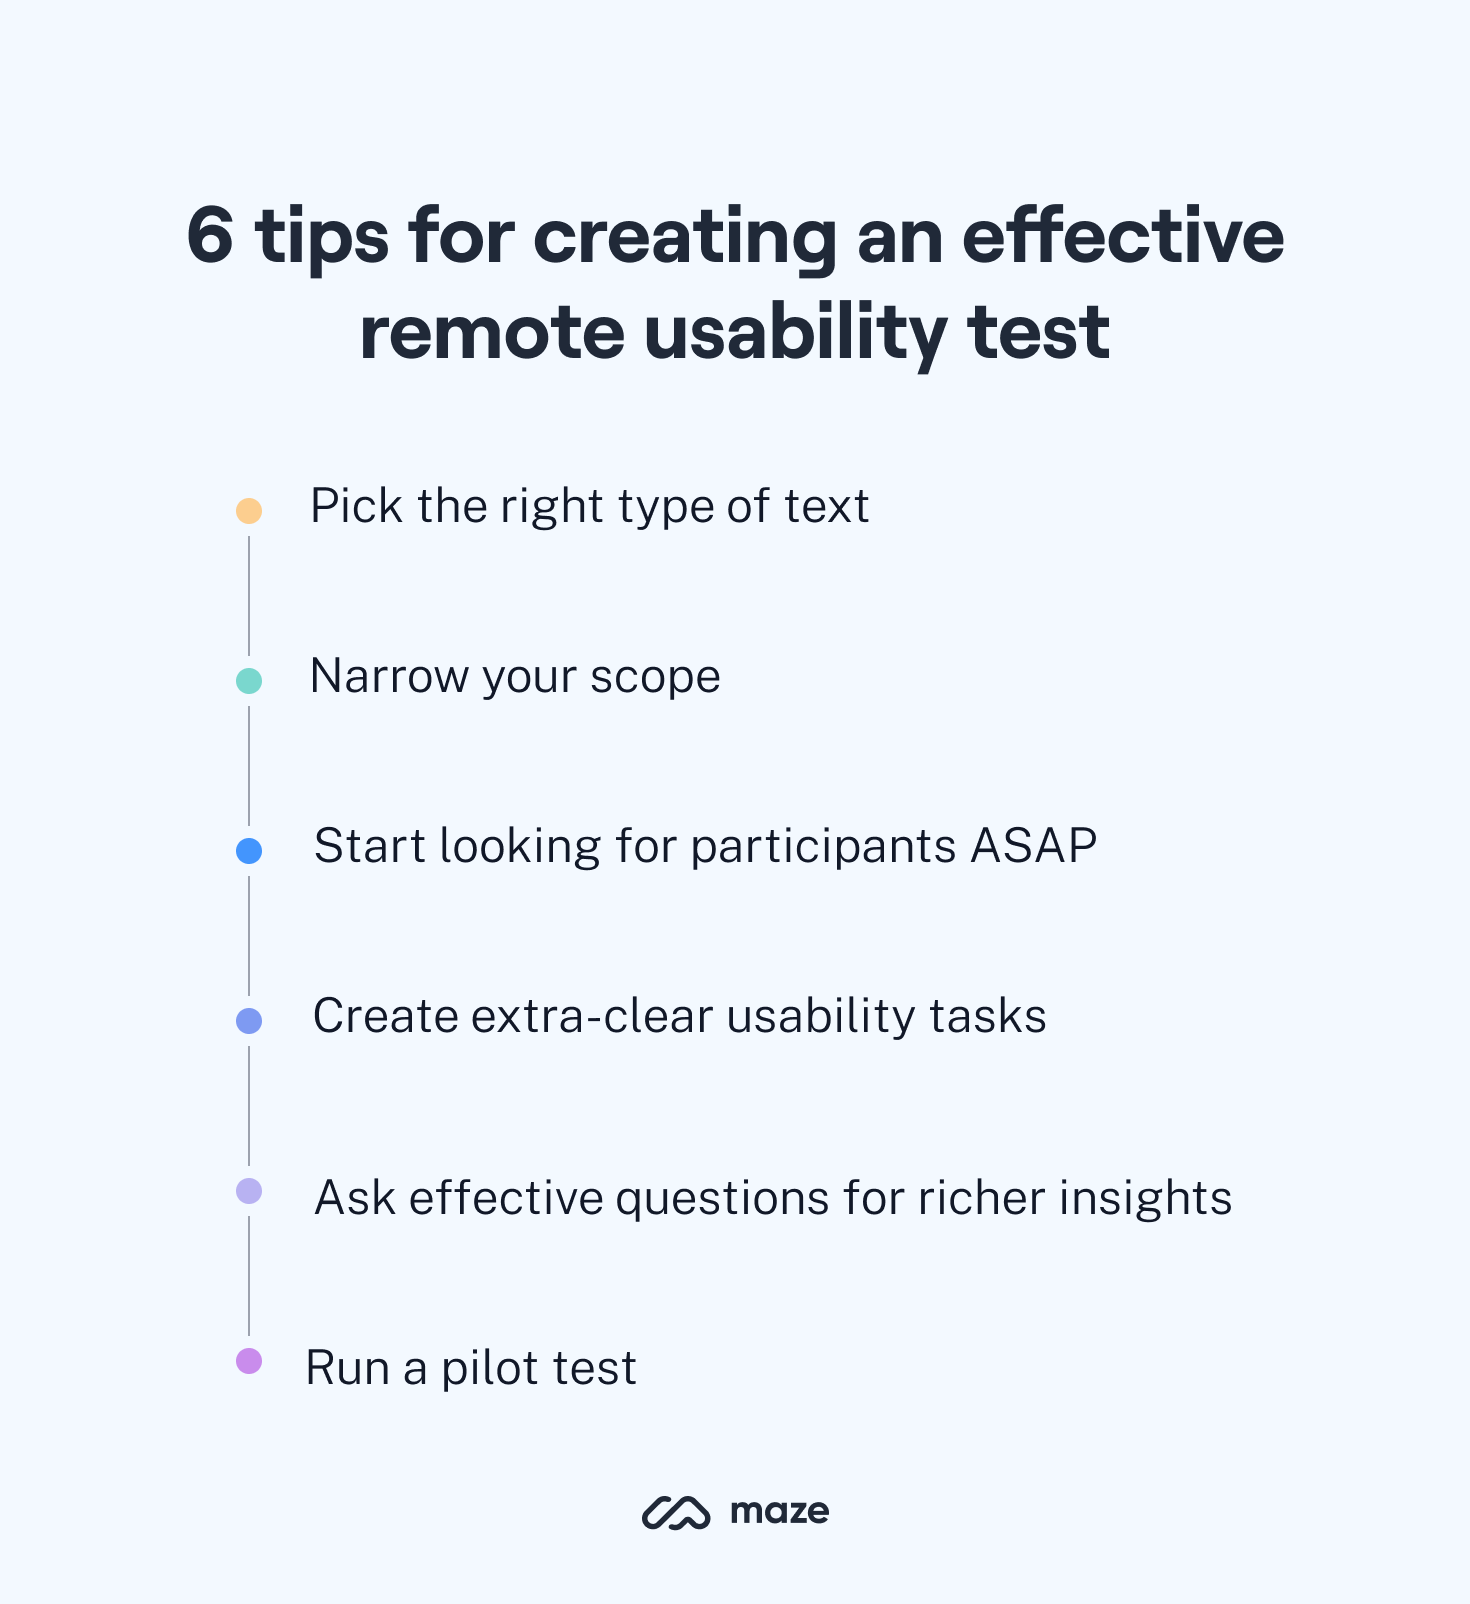 usability test tips